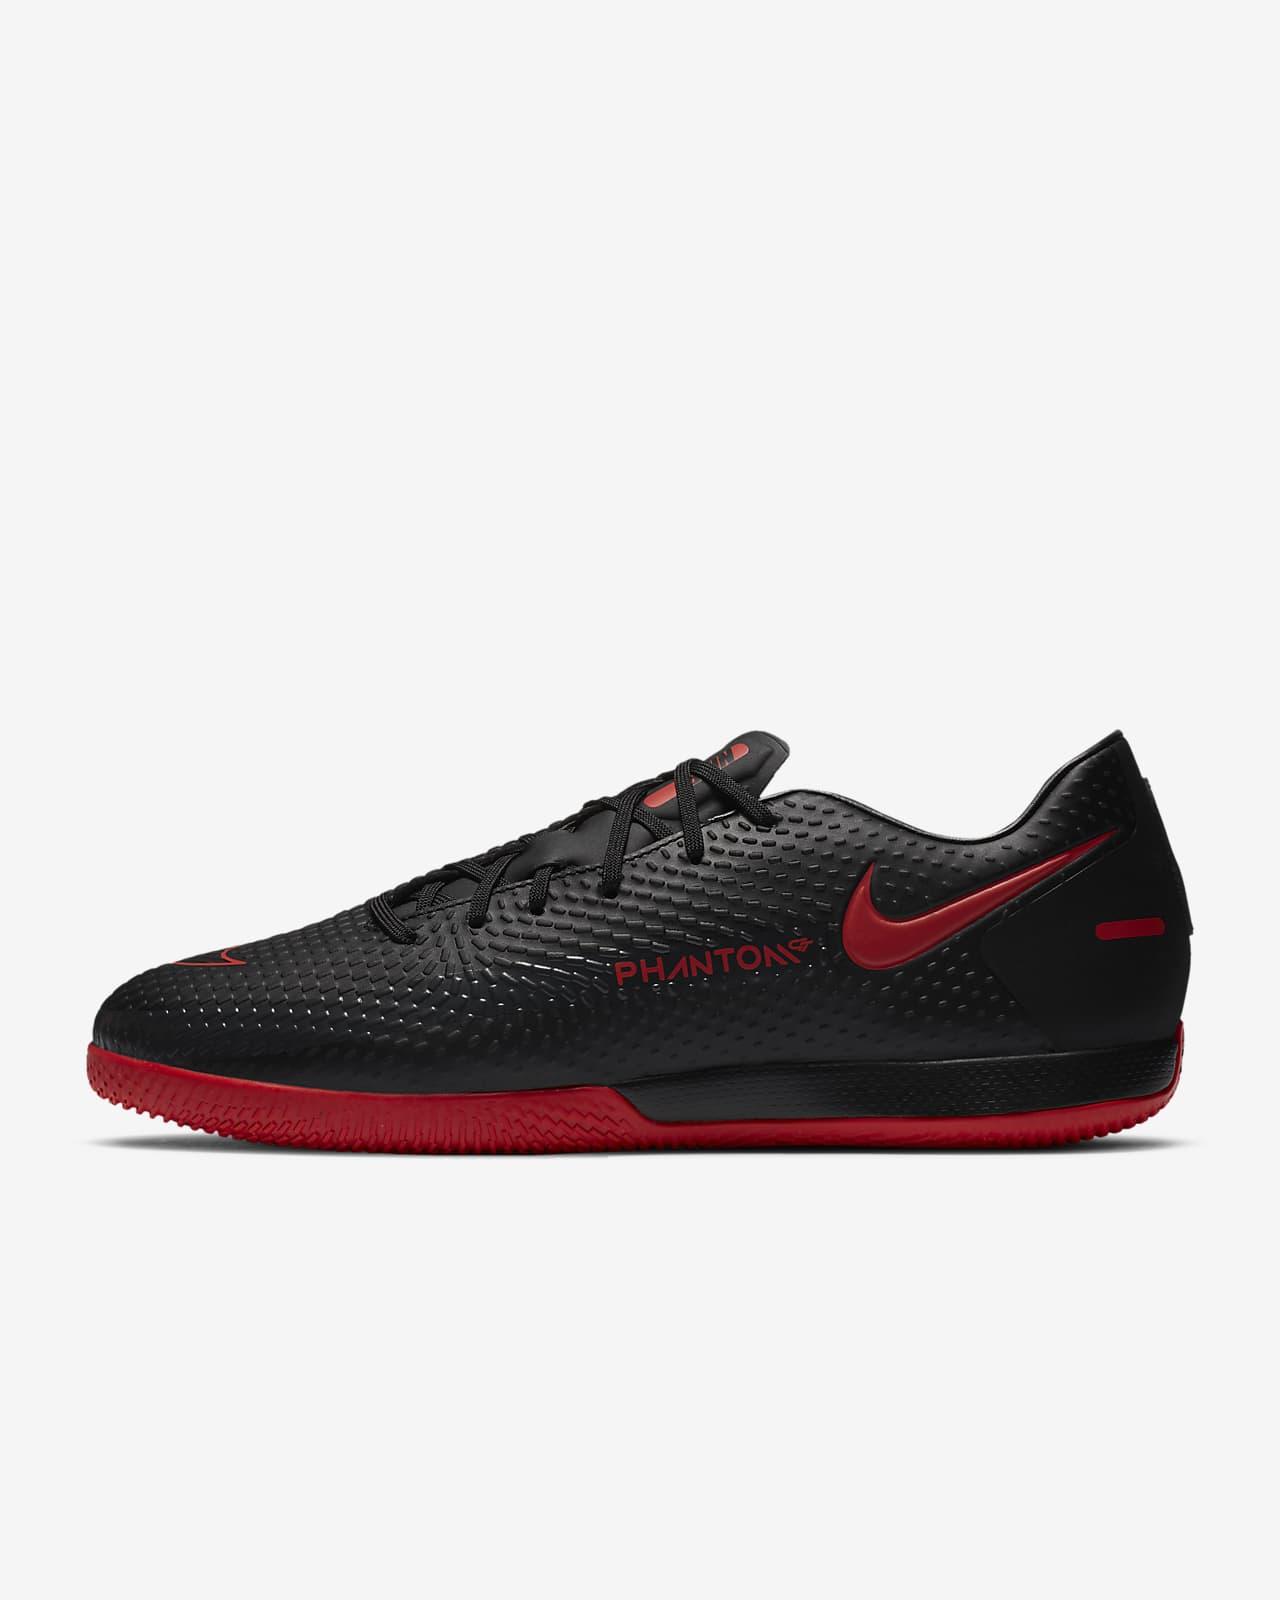 Chaussure de football en salle Nike Phantom GT Academy IC